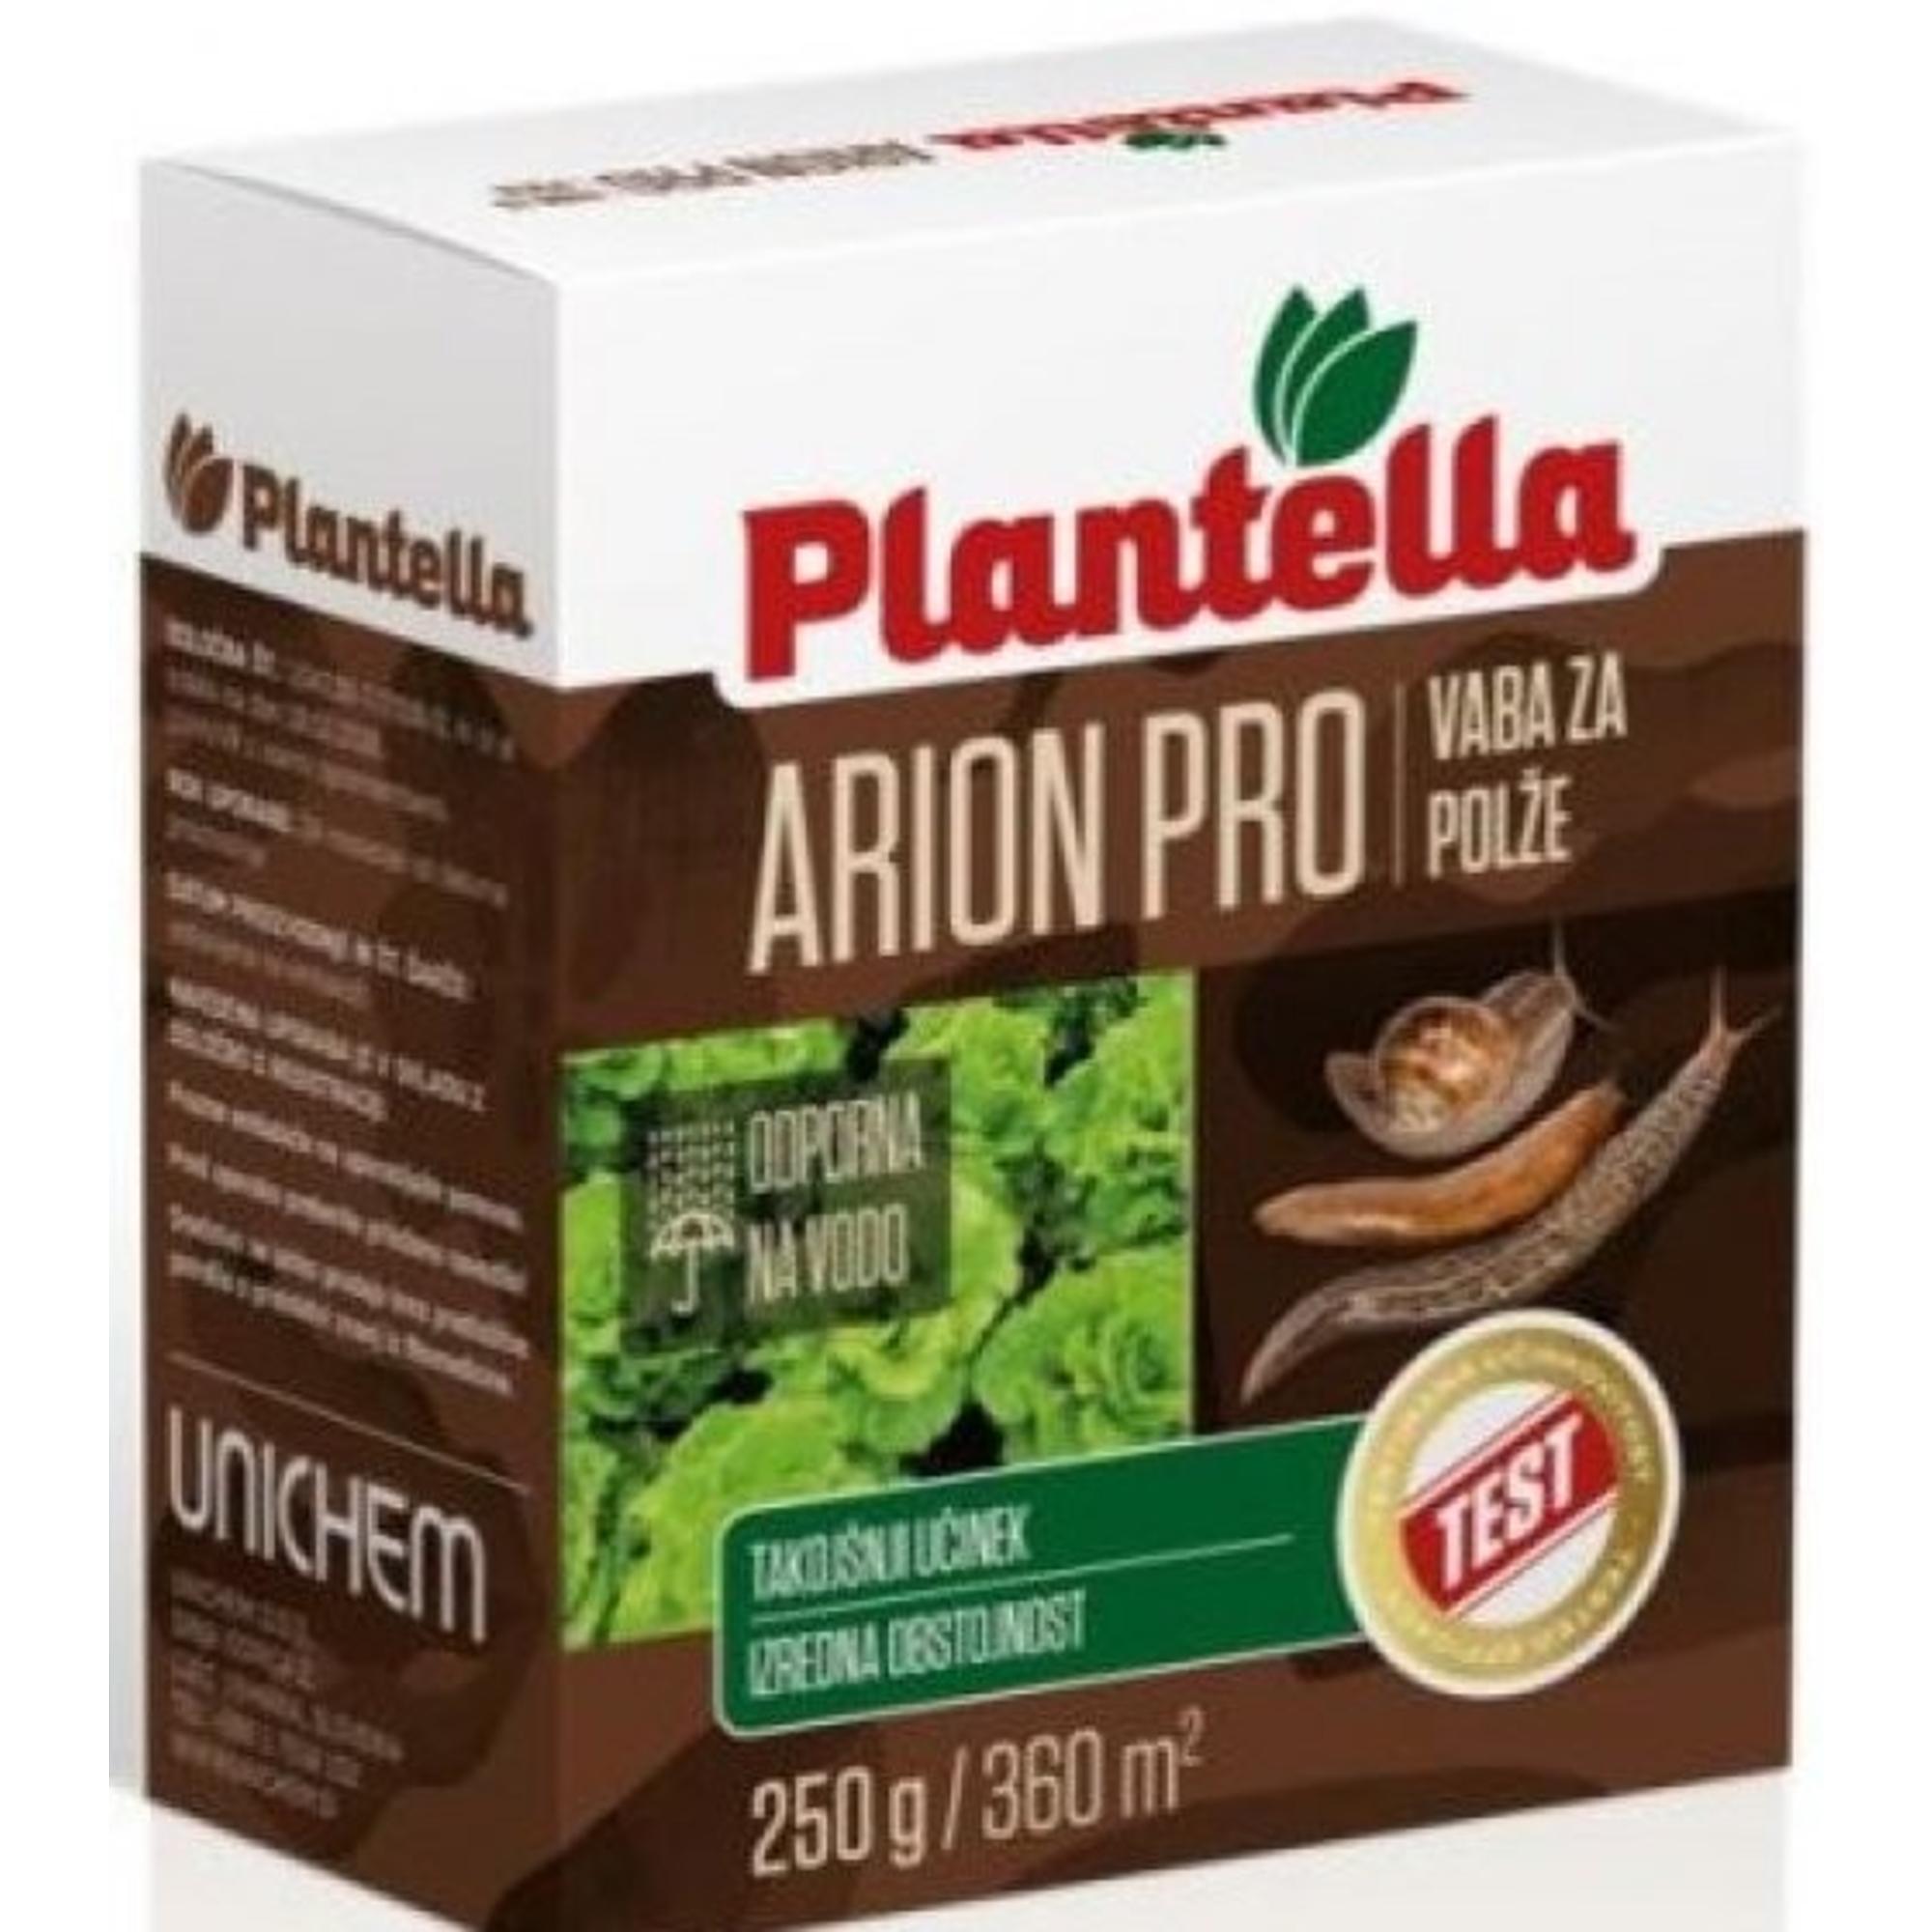 Bio Plantella Arion+ Csigaölő Szer 210g 52383